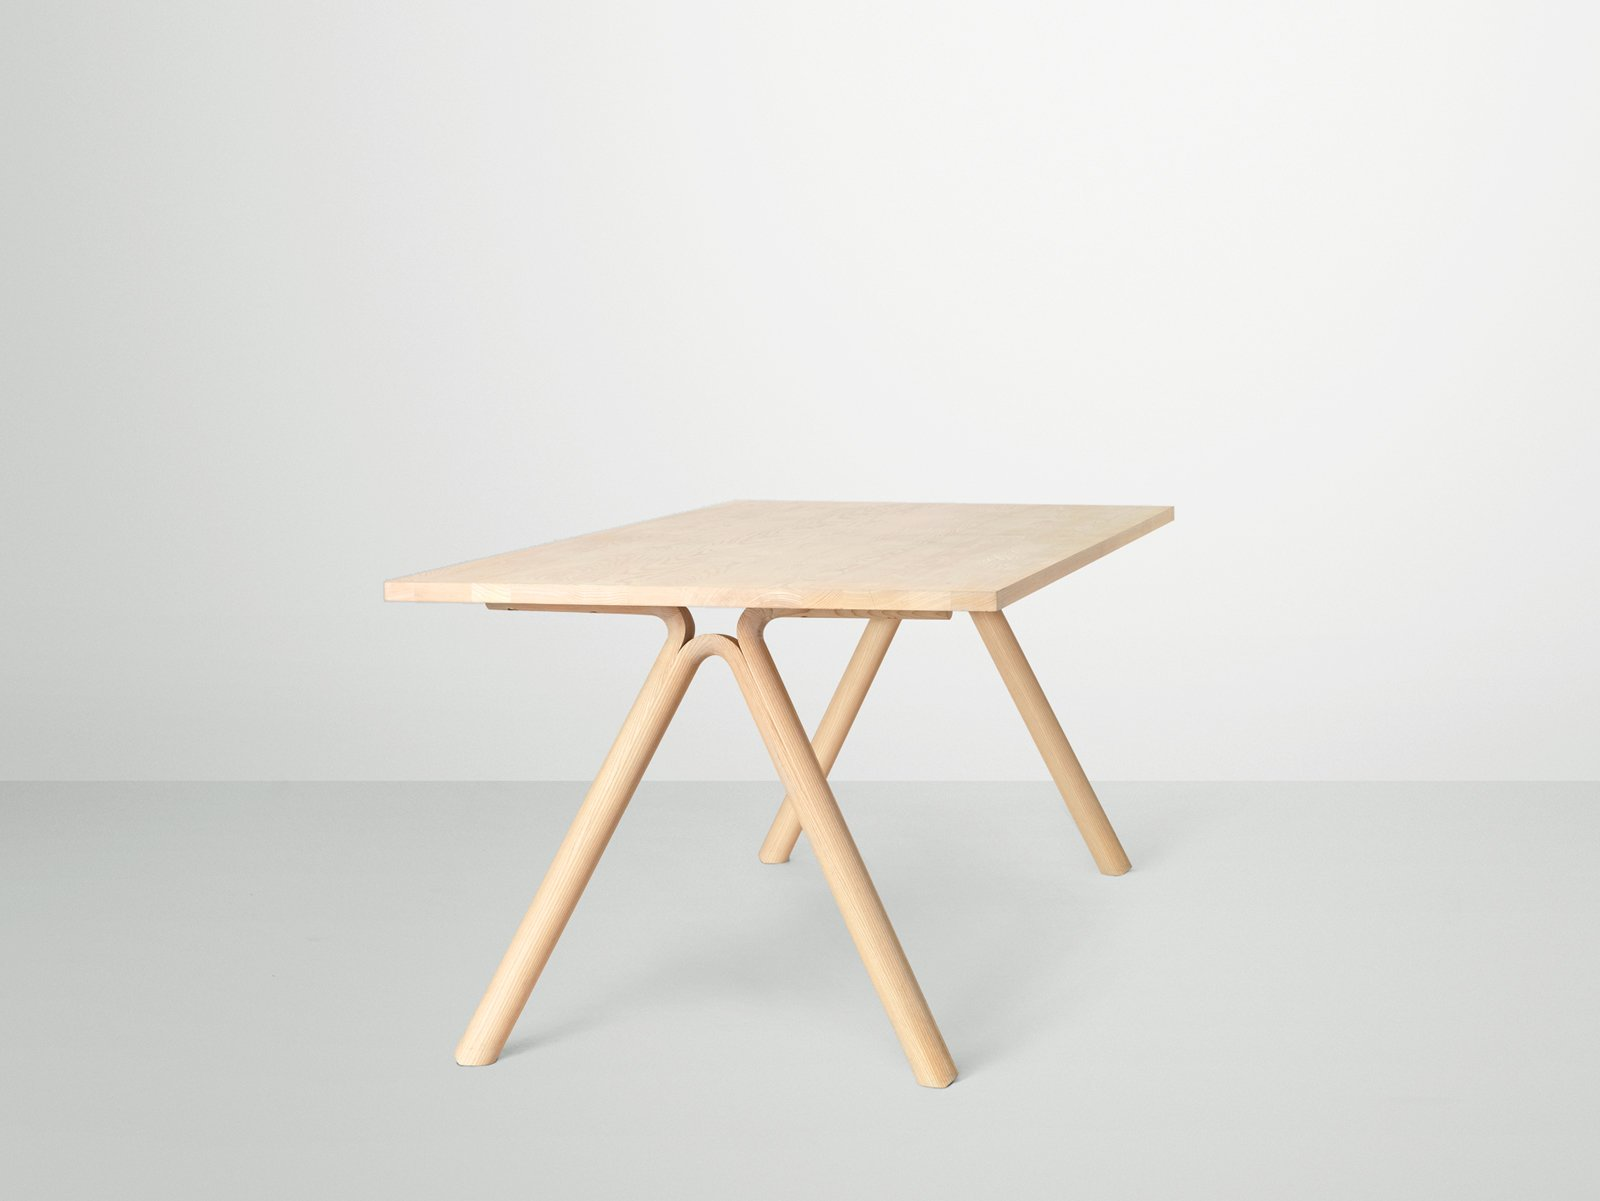 Split Table by Staffan Holm, $2,950  Photo 8 of 9 in Scandinavian Design Focus: Muuto